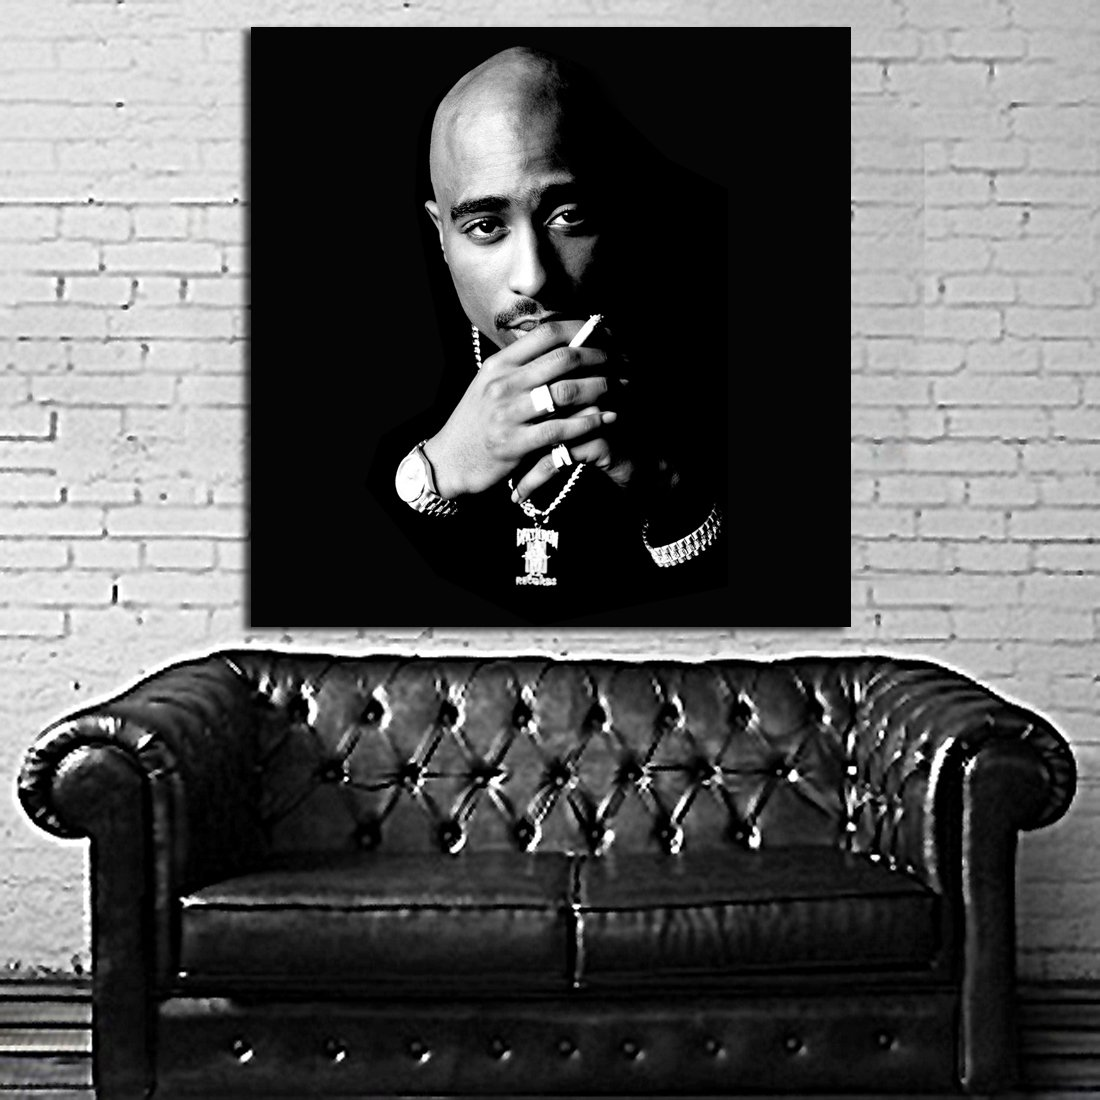 Poster Mural Tupac 2pac 40x40 inch (100x100 cm) on Adhesive Vinyl #90